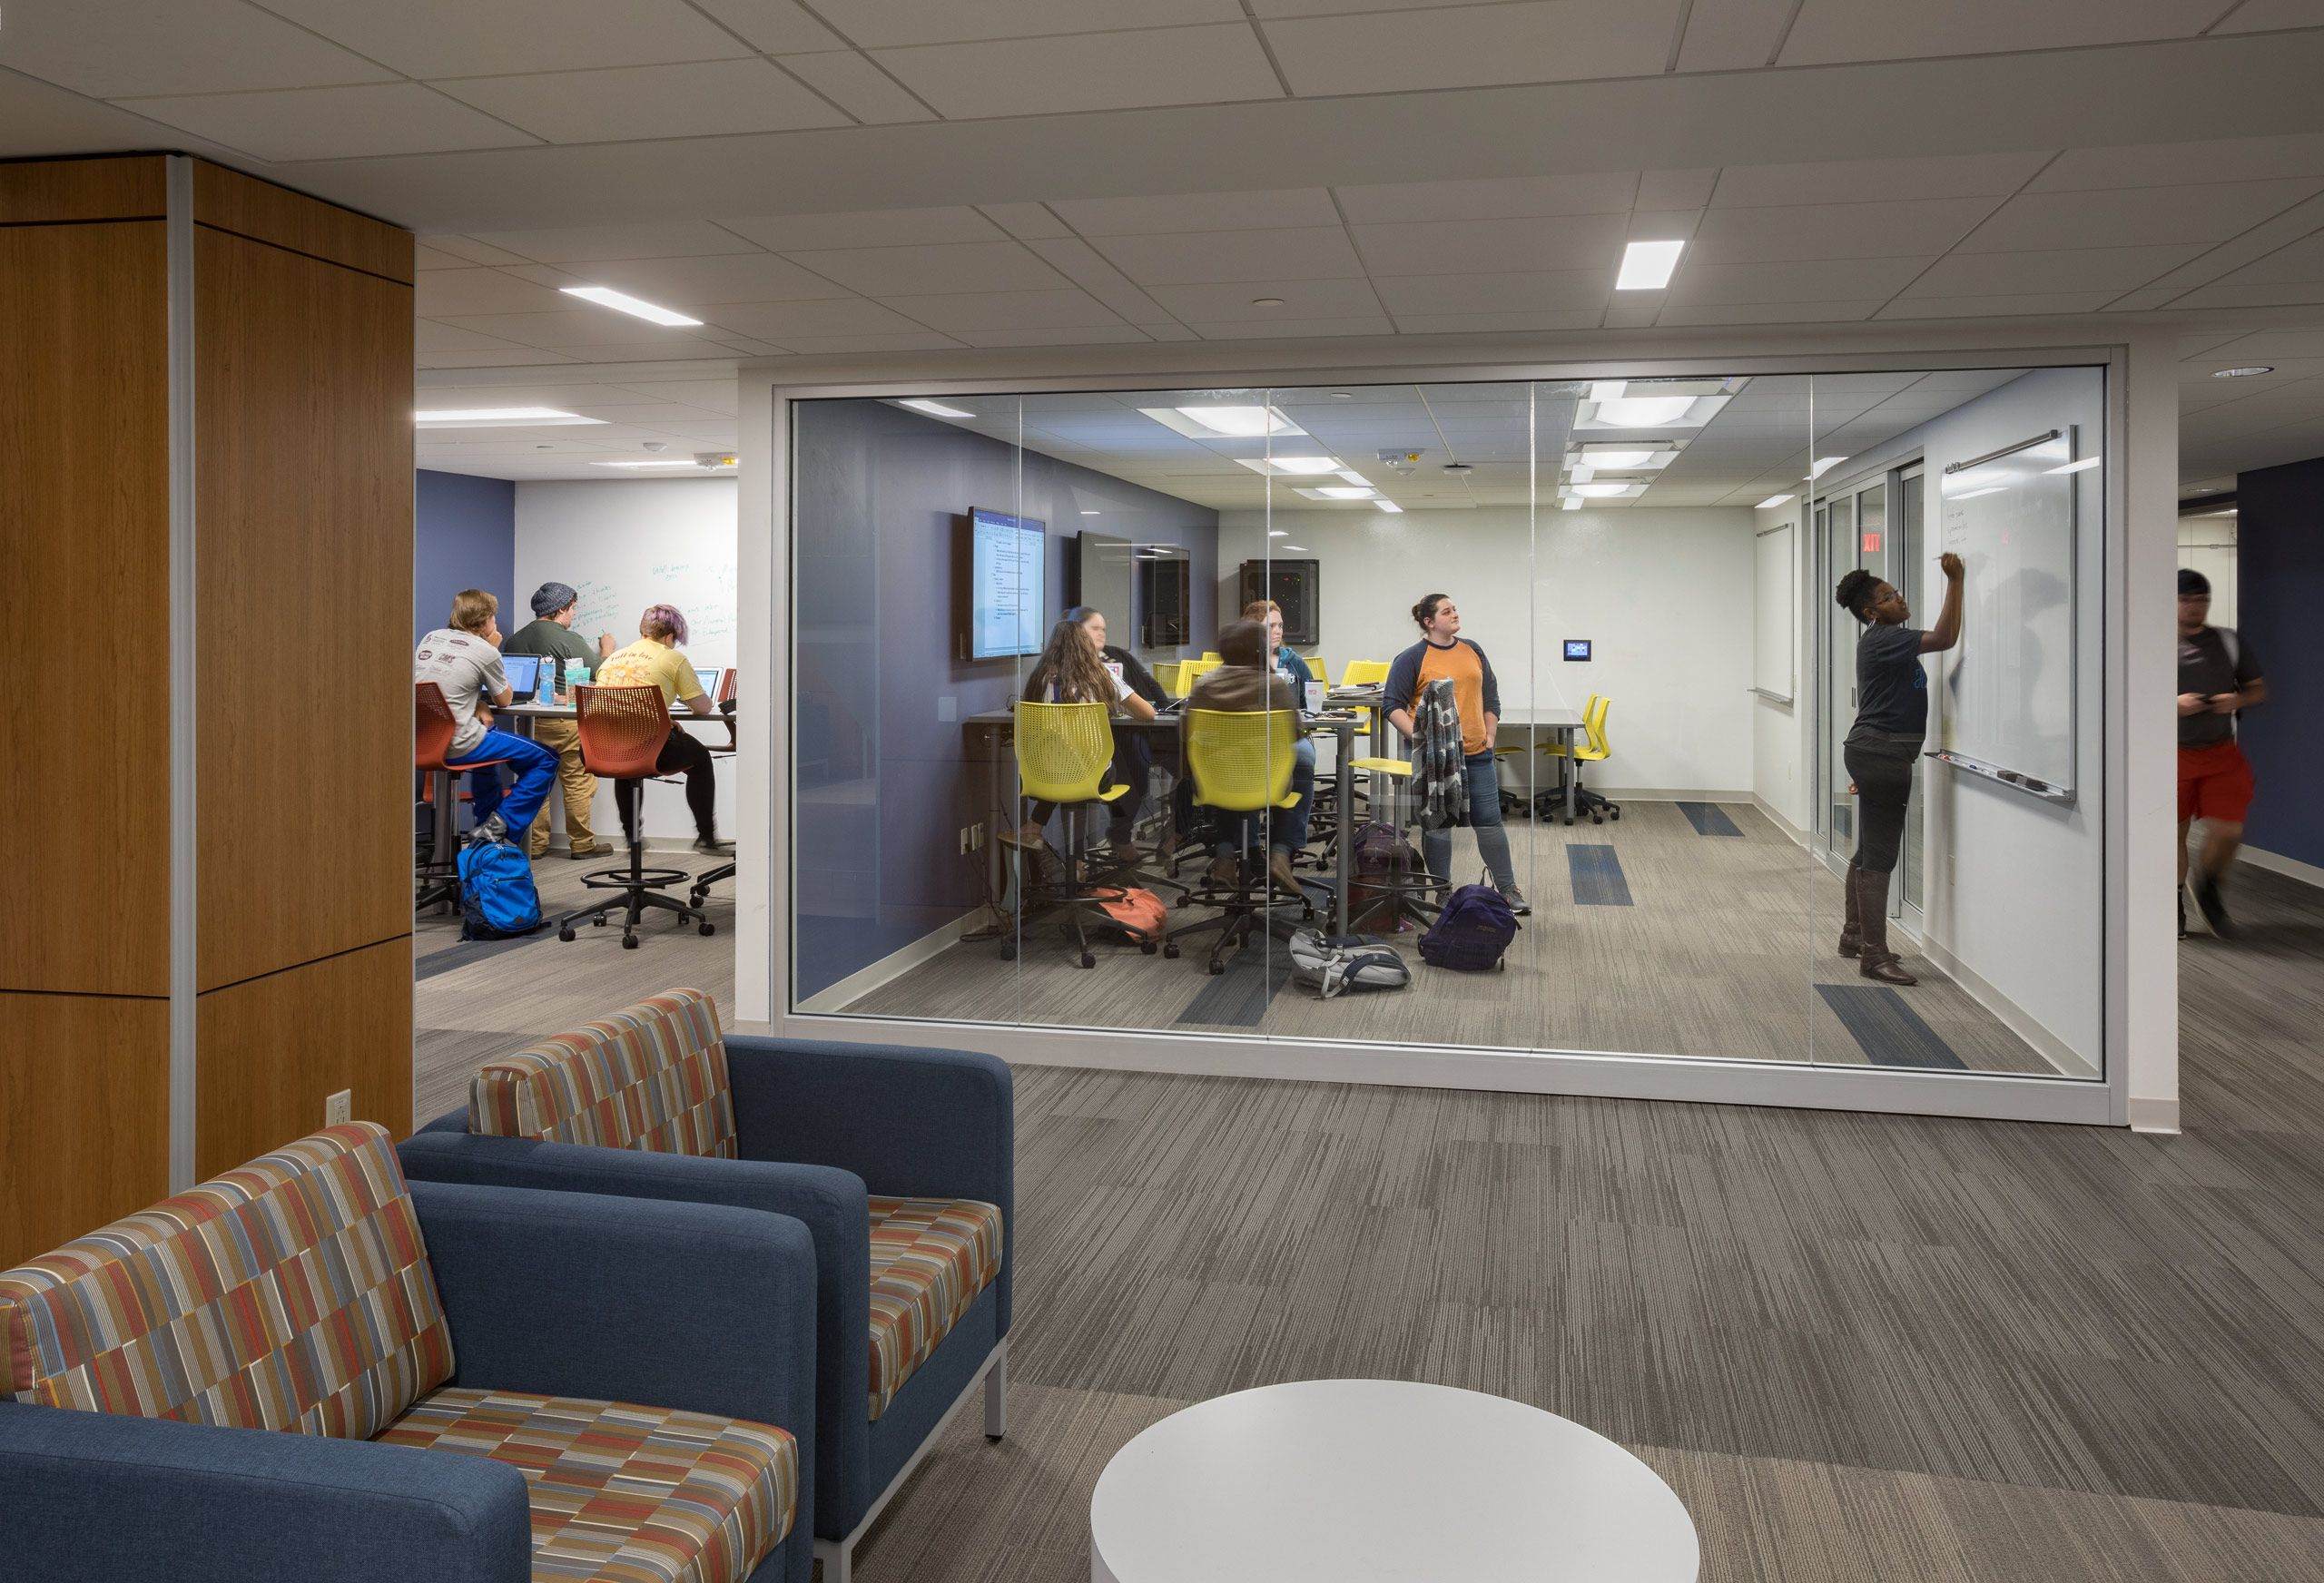 Hastings+Chivetta  /  Millikin University Commons, Decatur, Illinois